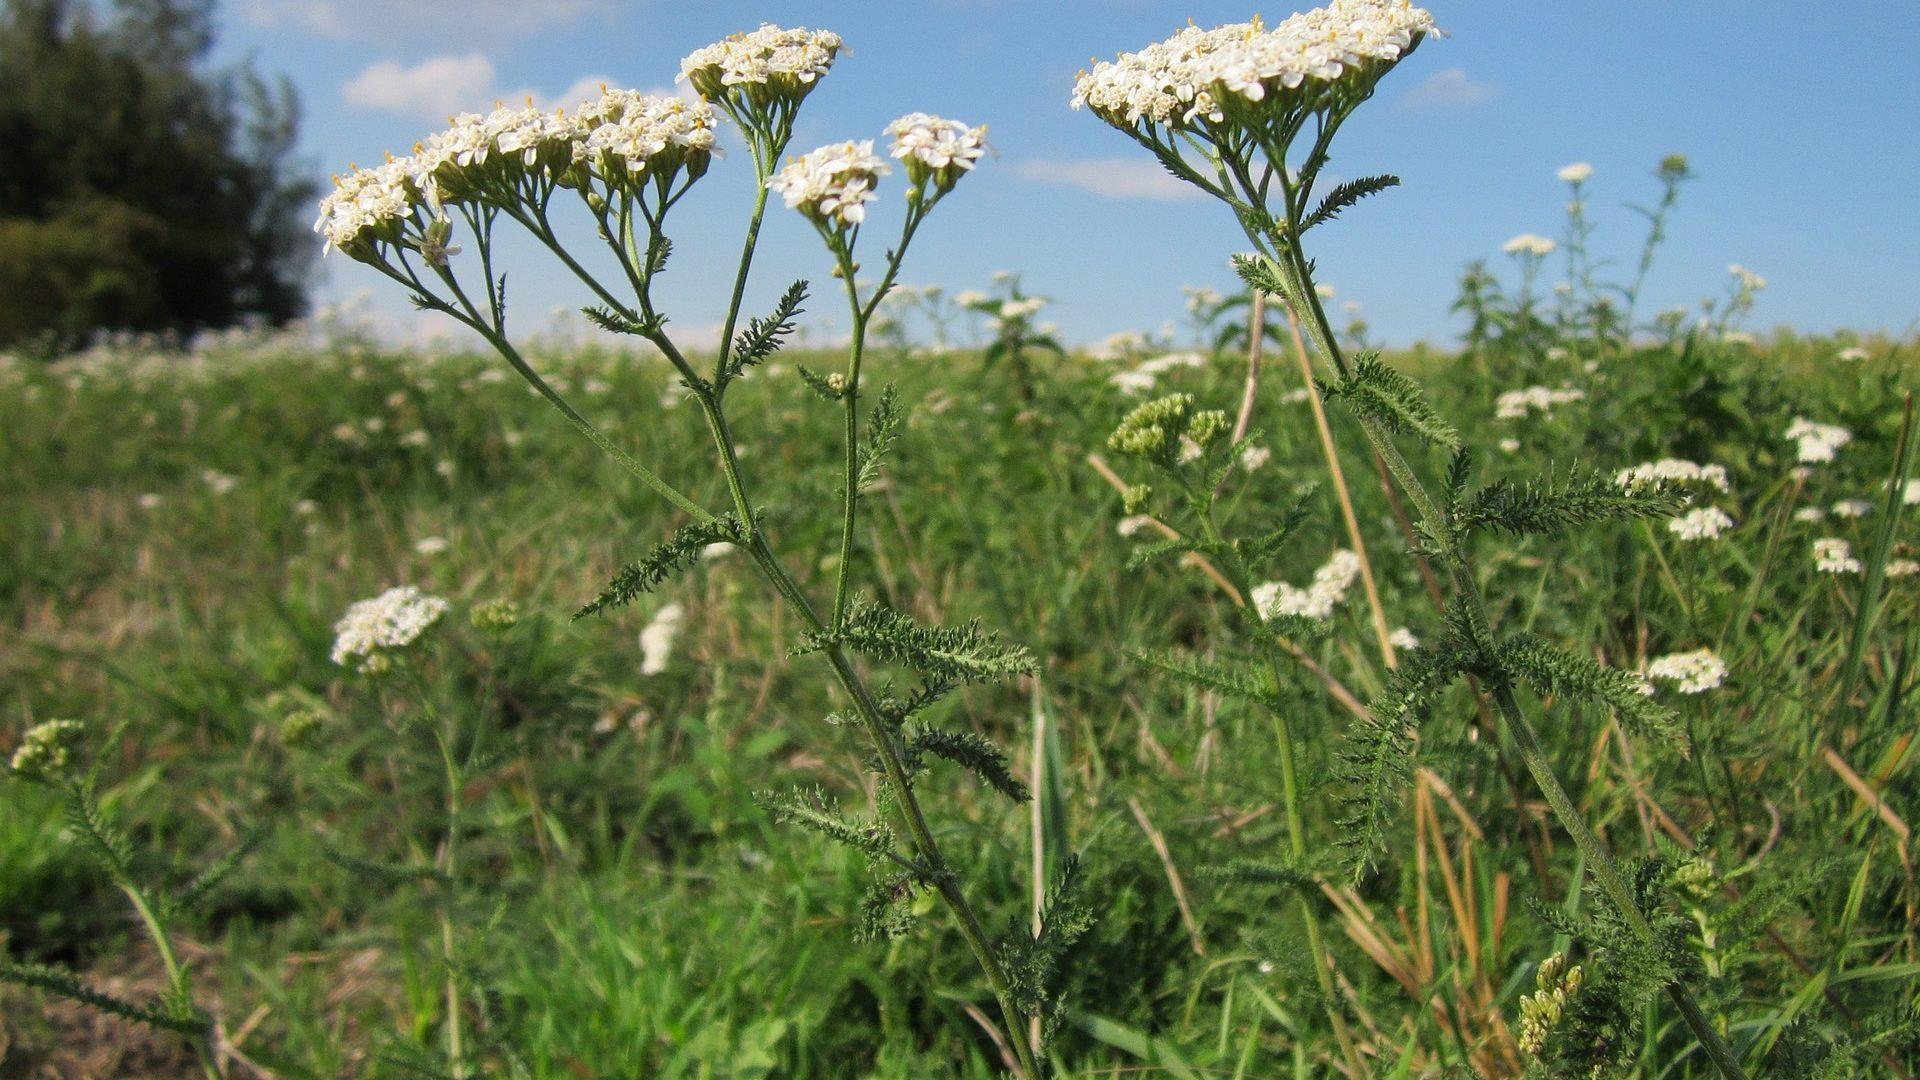 Wild Meadow Flowers: